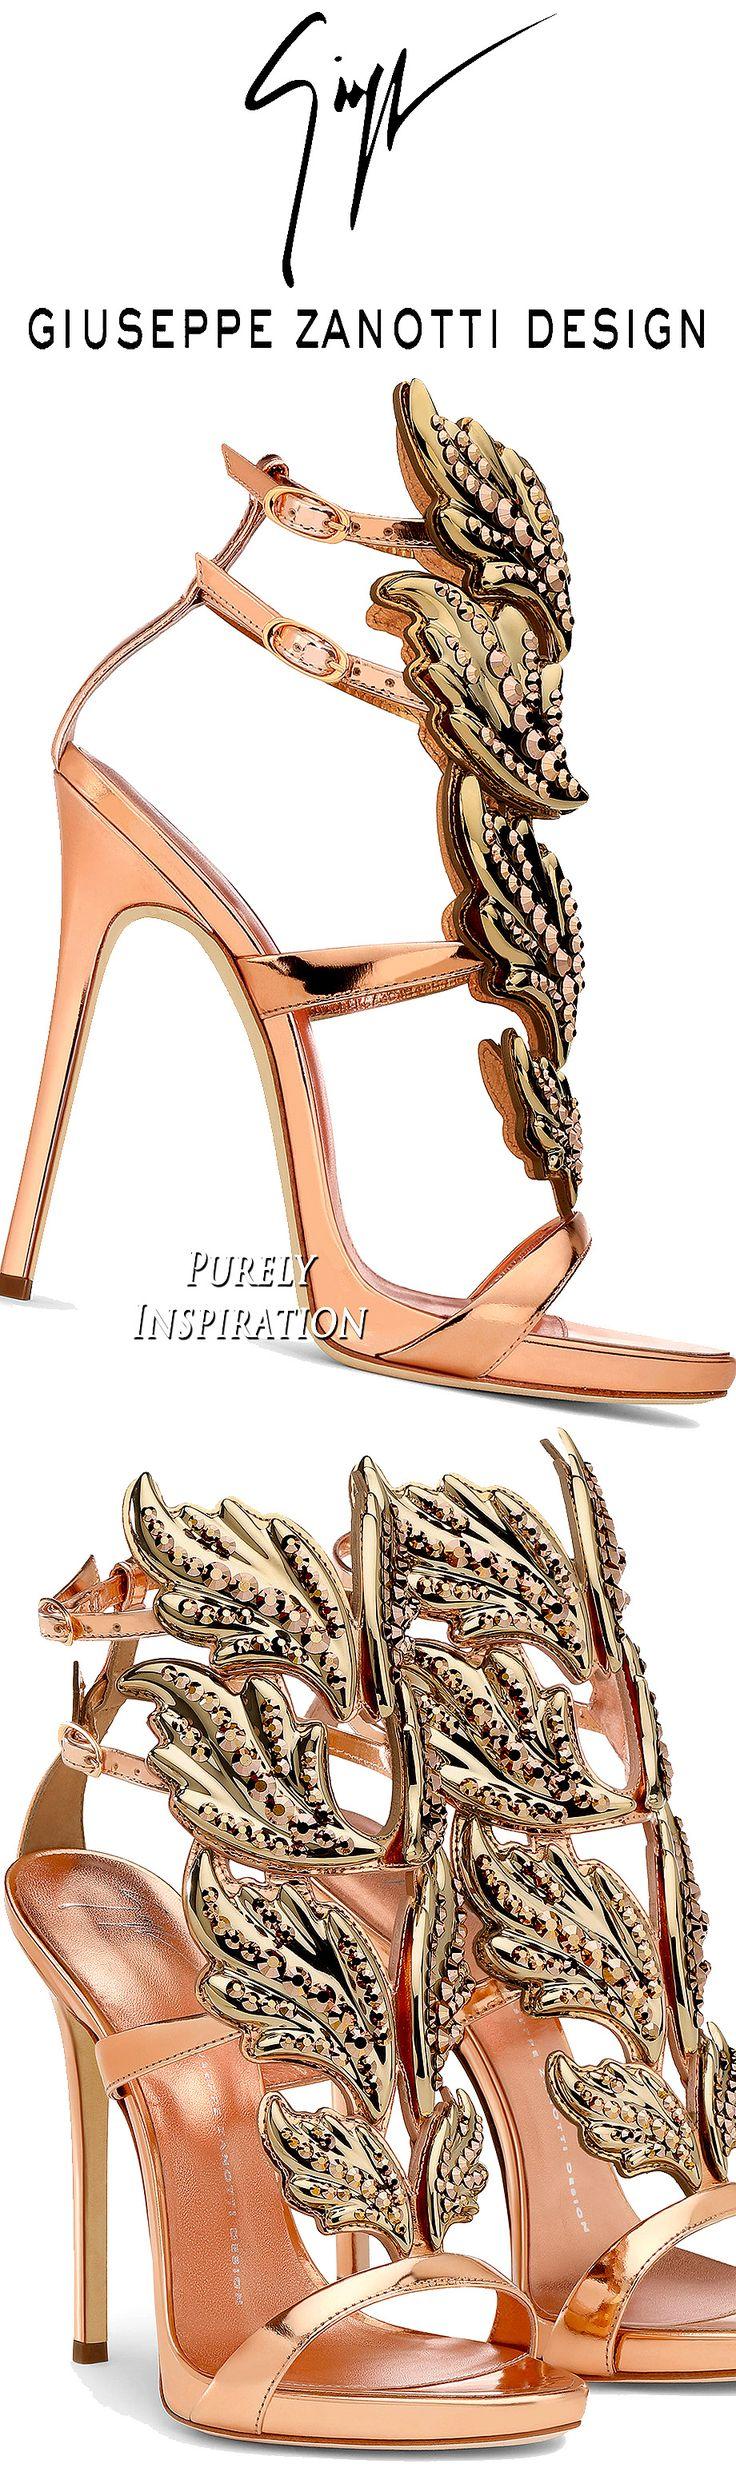 Giuseppe Zanotti Cruel Sandal | Purely Inspiration